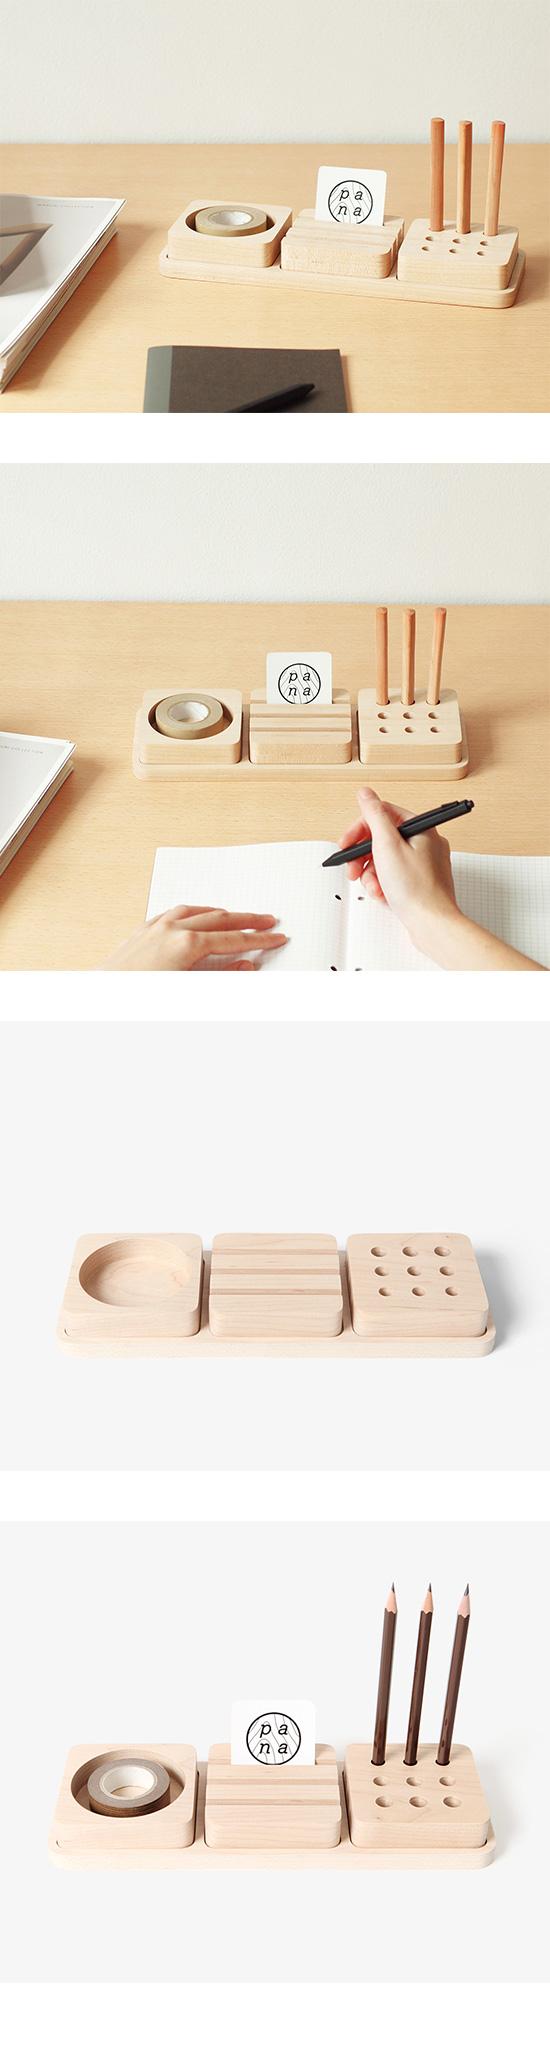 pana objects Tofu Mini Stationary set 豆腐積木 文具收納盤 S